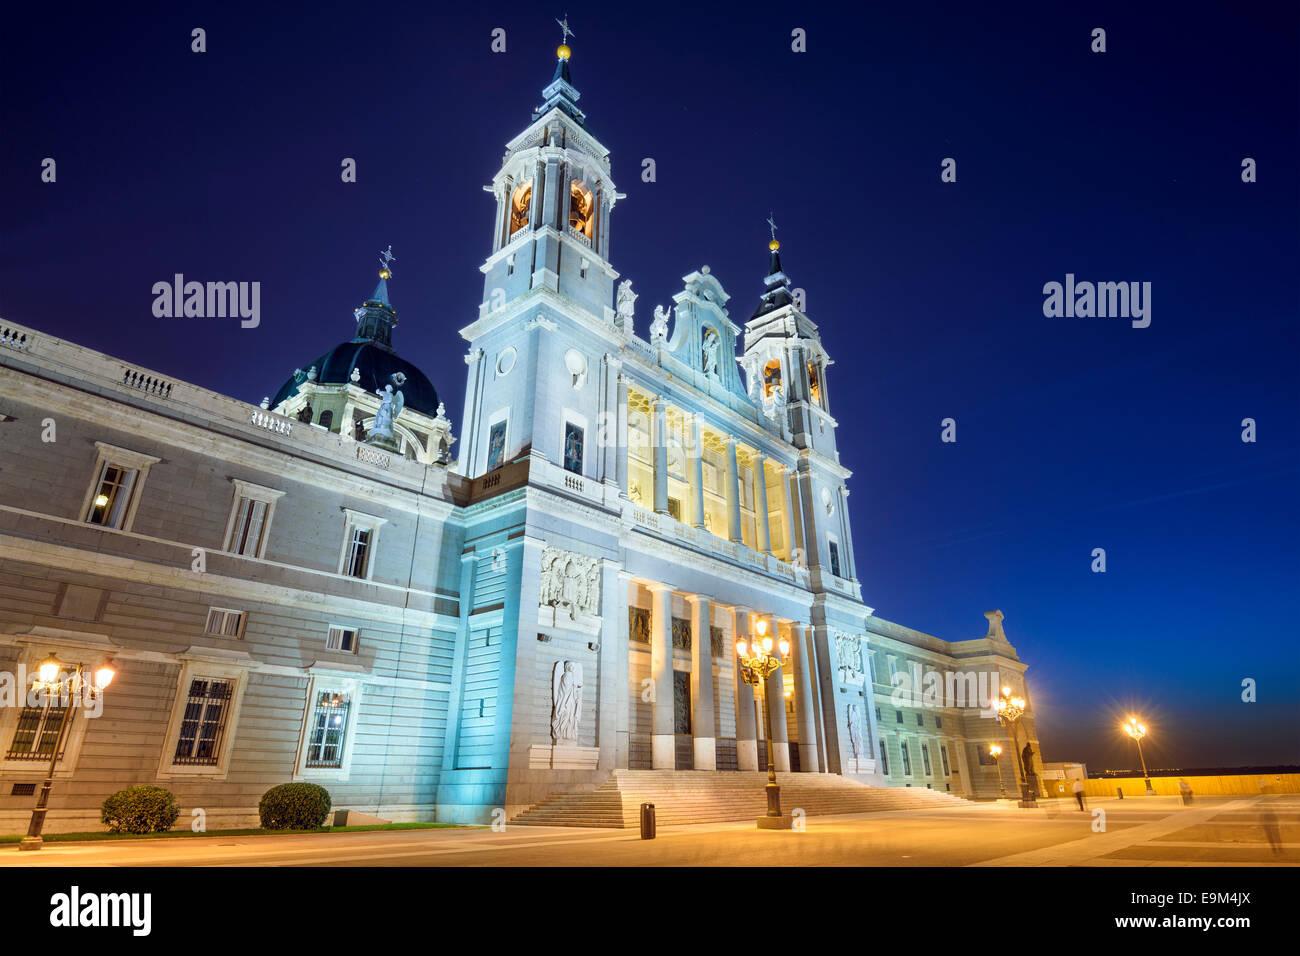 Madrid, Spain at La Almudena Cathedral at night. - Stock Image